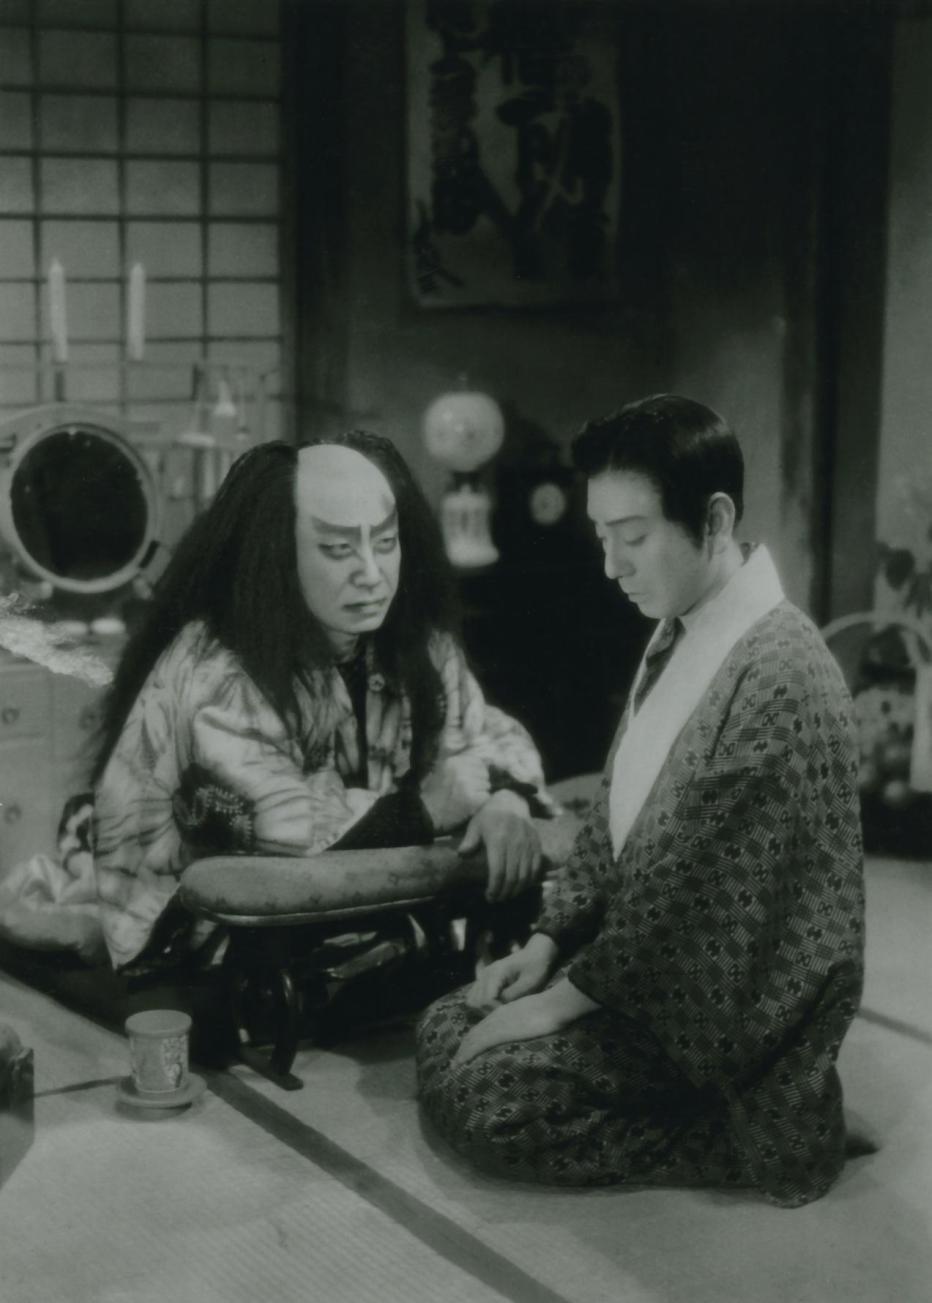 storia-dellultimo-crisantemo-zangiku-monogatari-1939-kenji-mizoguchi-02.jpg